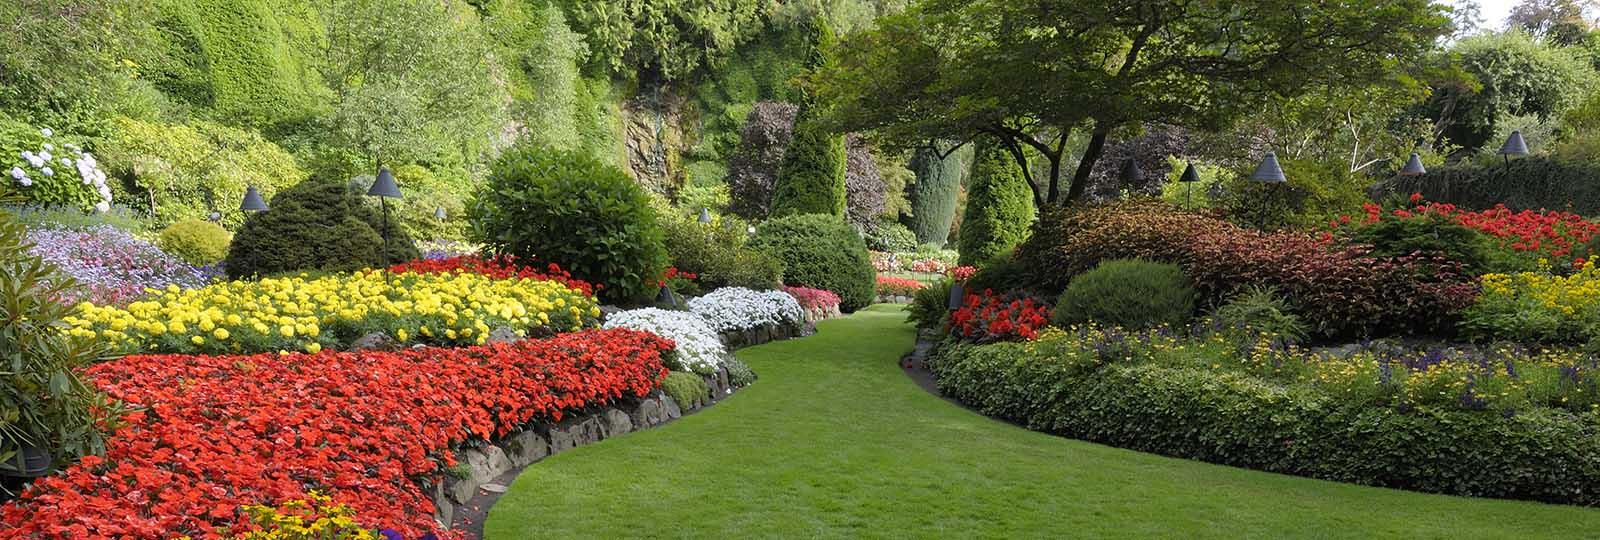 Landscaping Quotes Mesmerizing Secret Landscaping Garden Landscaping Quotes ...